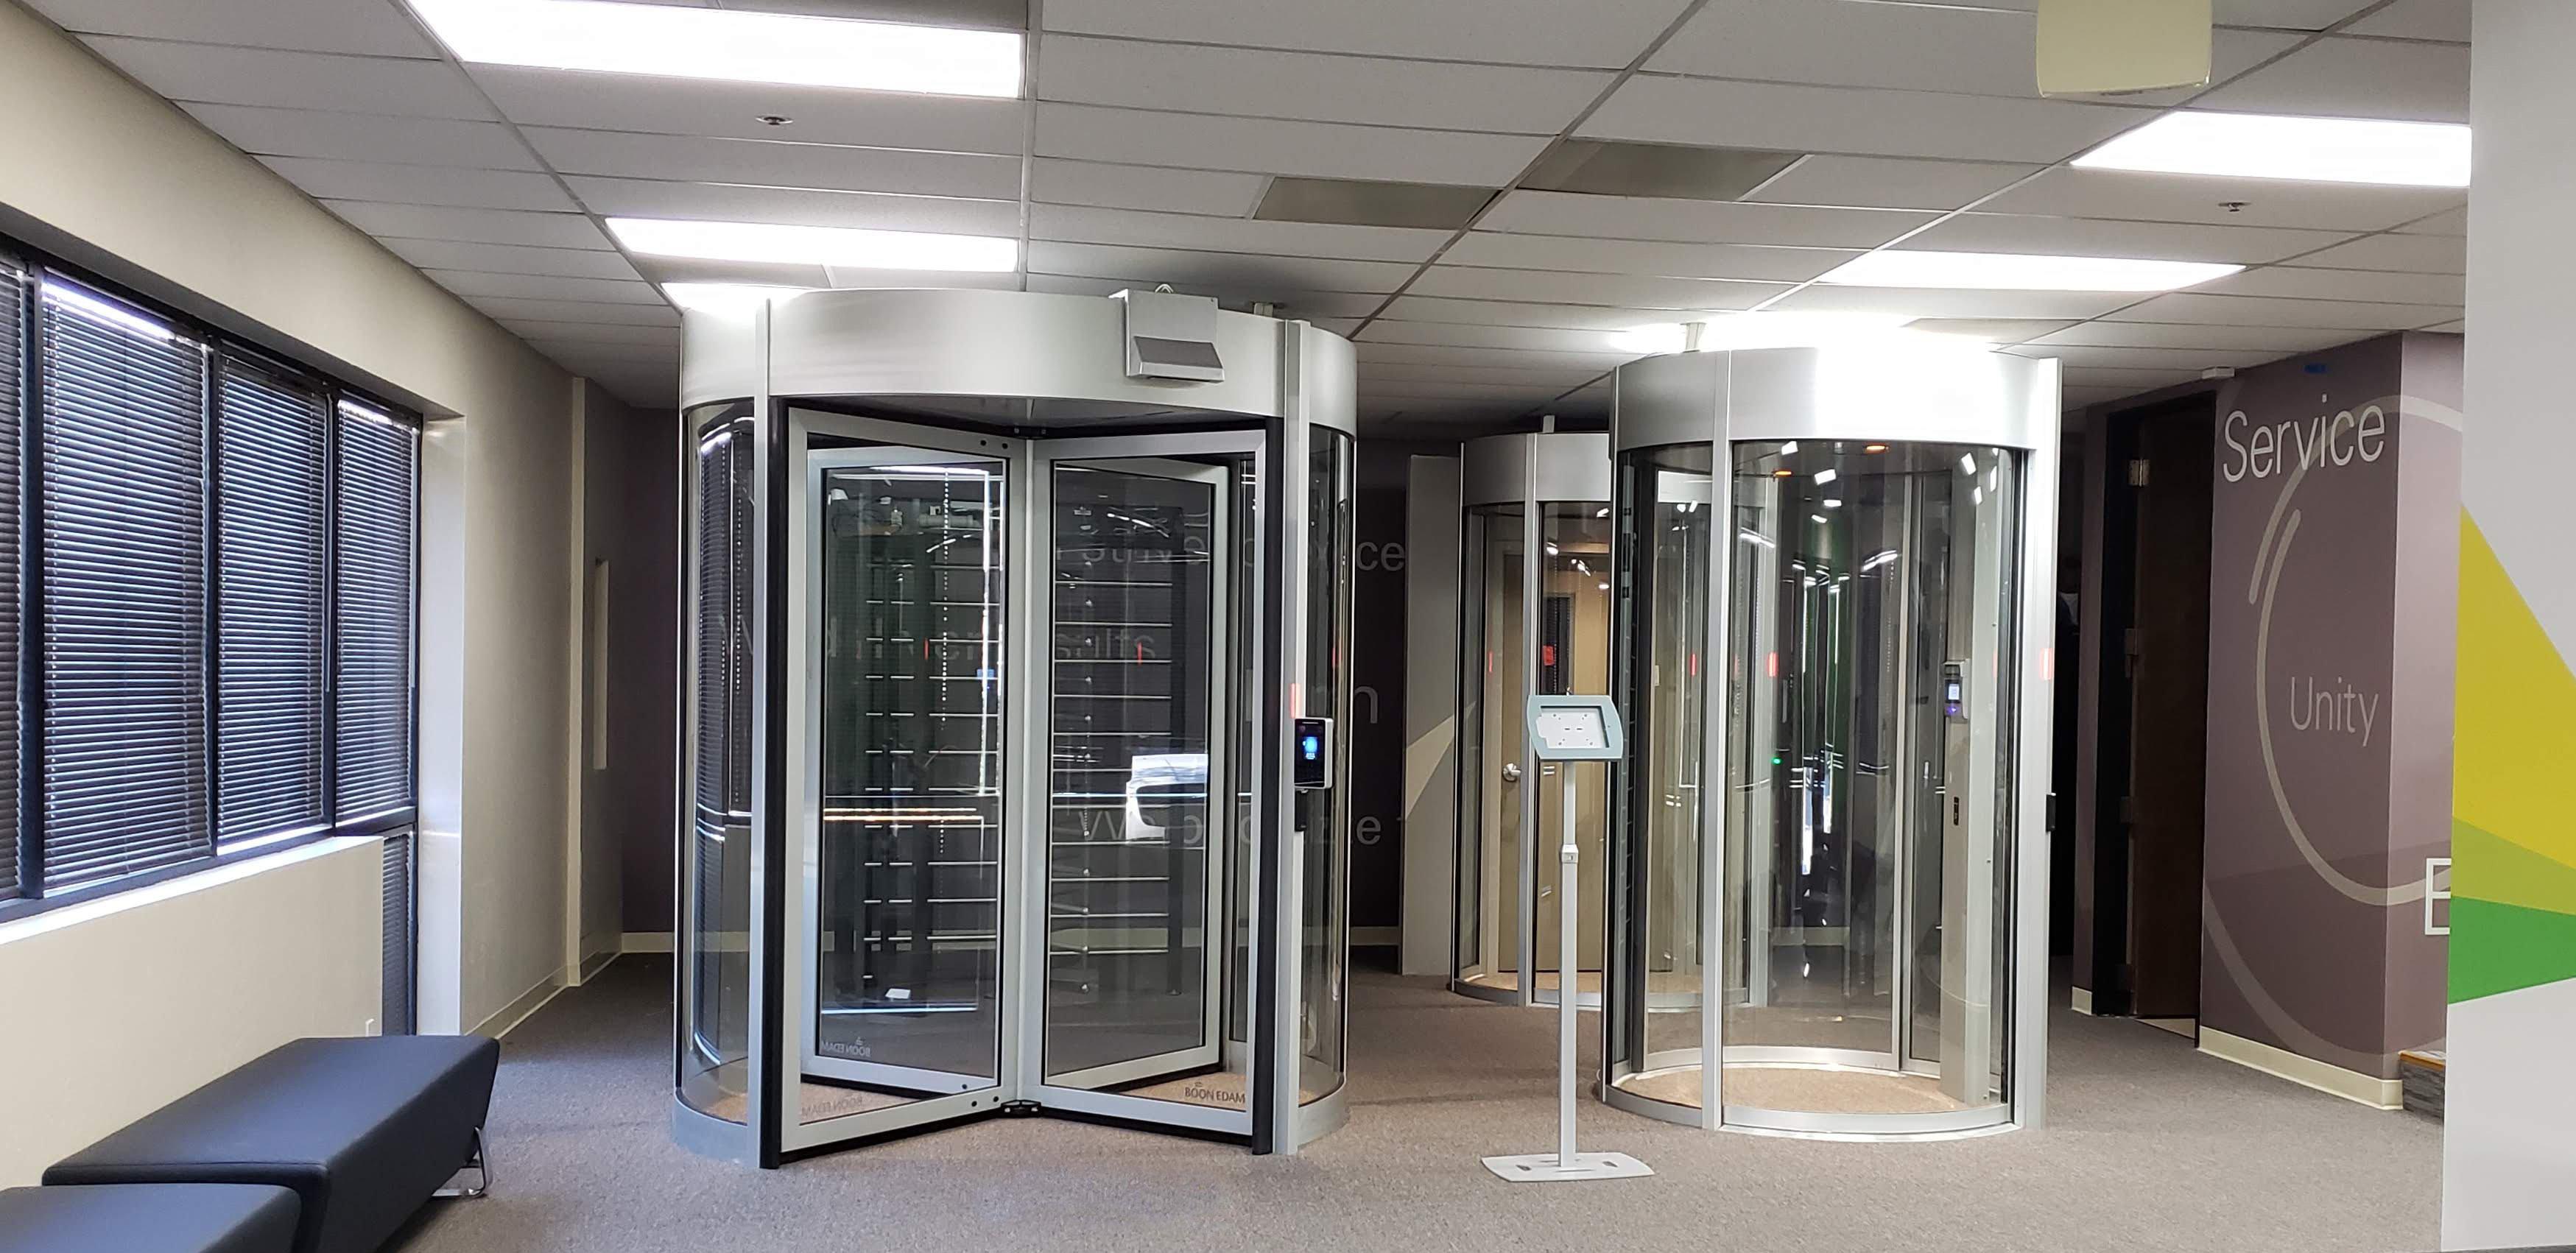 Boon Edam's San Jose Technology and Training Center